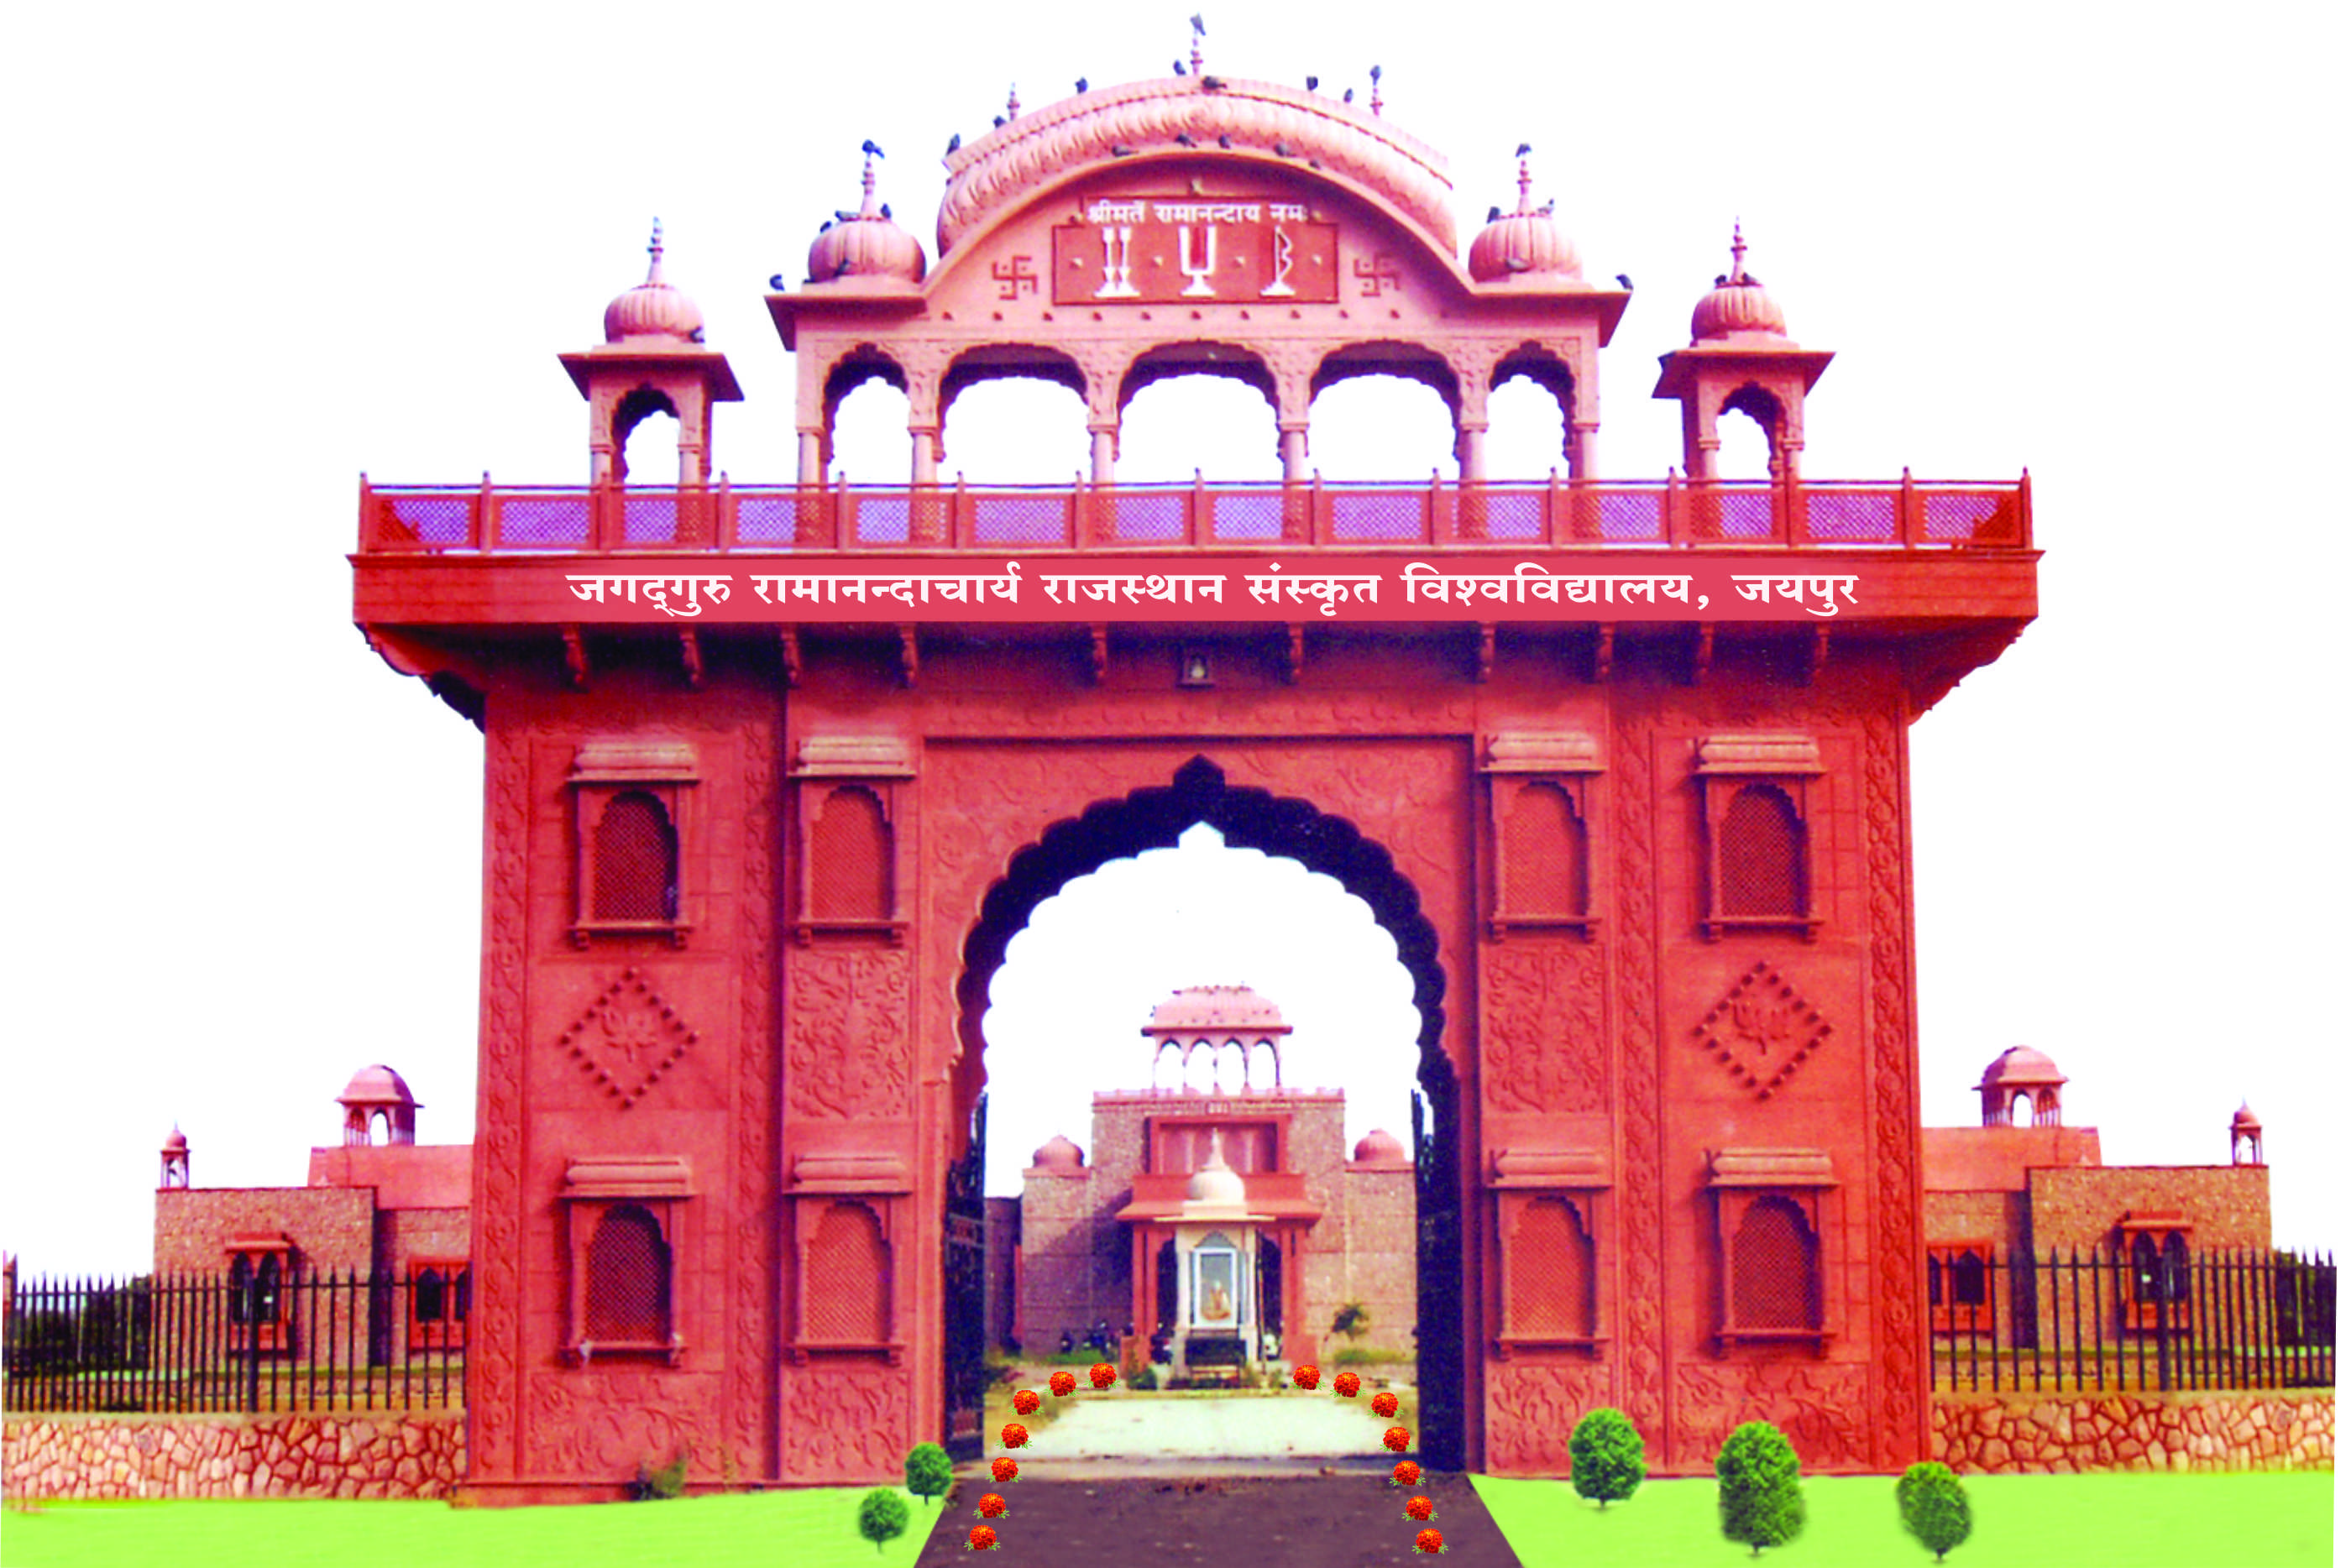 JRRSU (Jagadguru Ramanandacharya Rajasthan Sanskrit University)